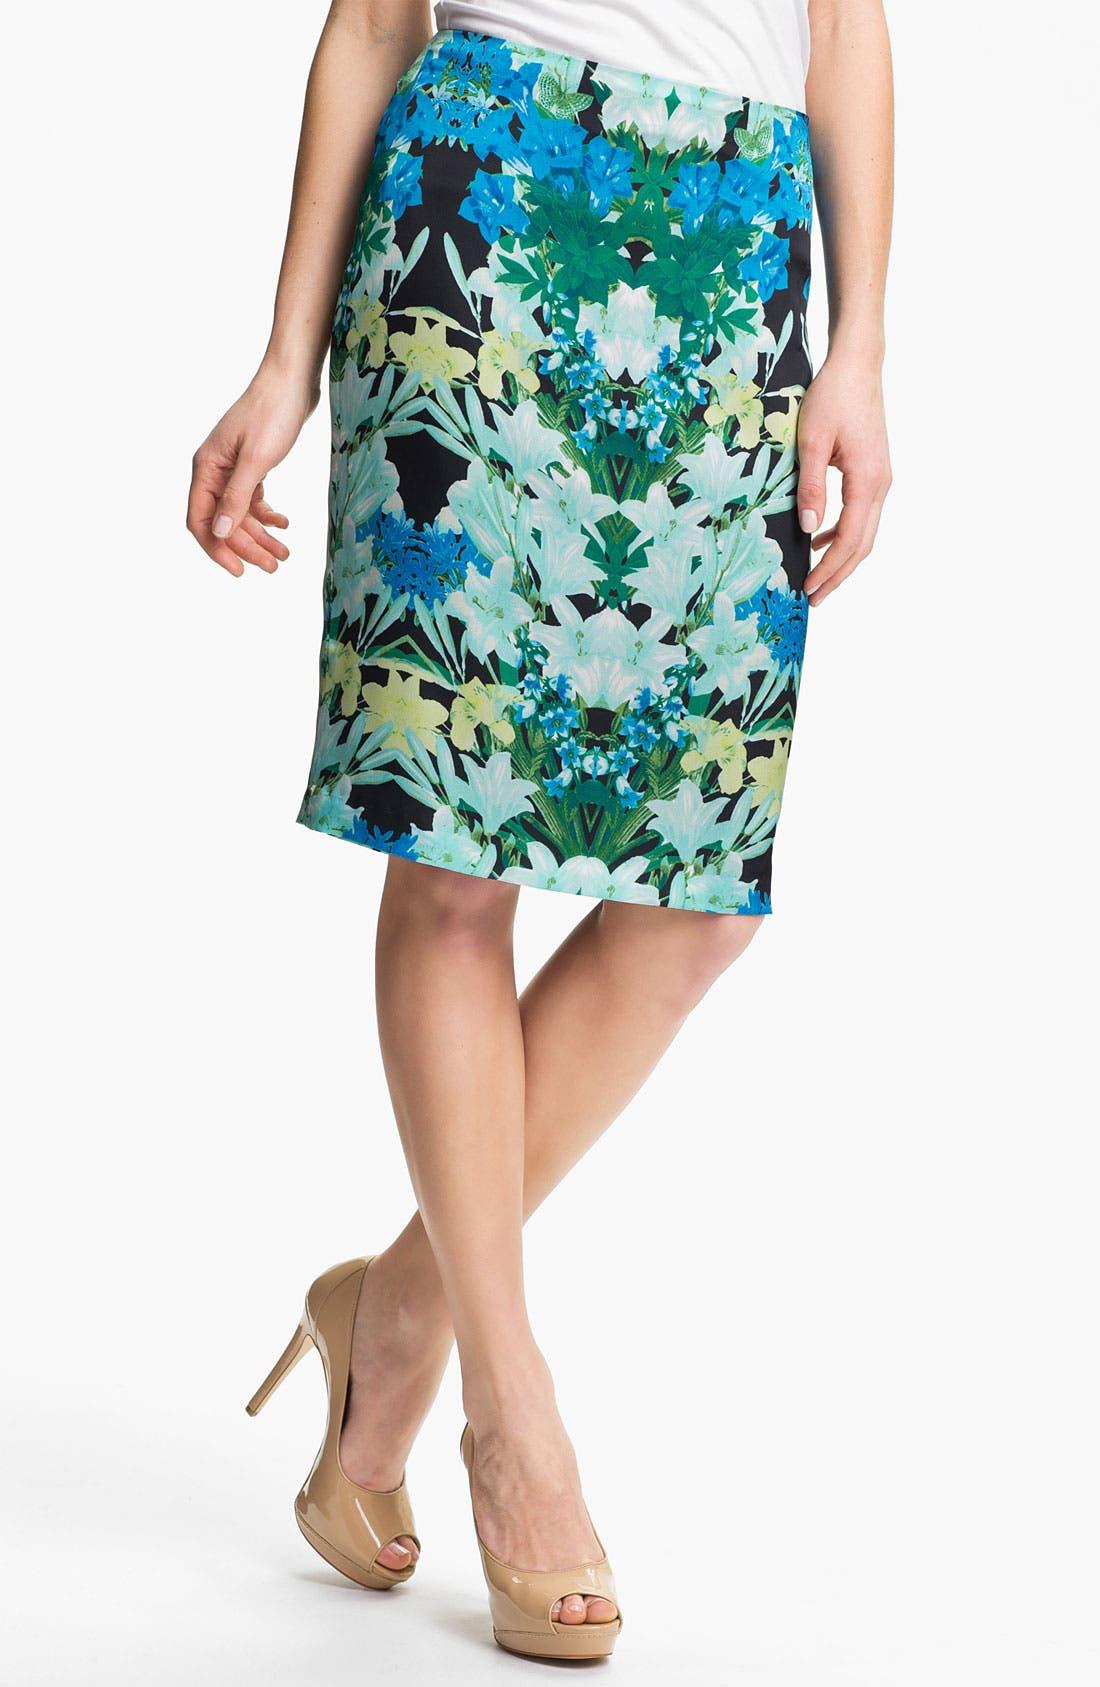 Main Image - Vince Camuto 'Spring Garlands' Pencil Skirt